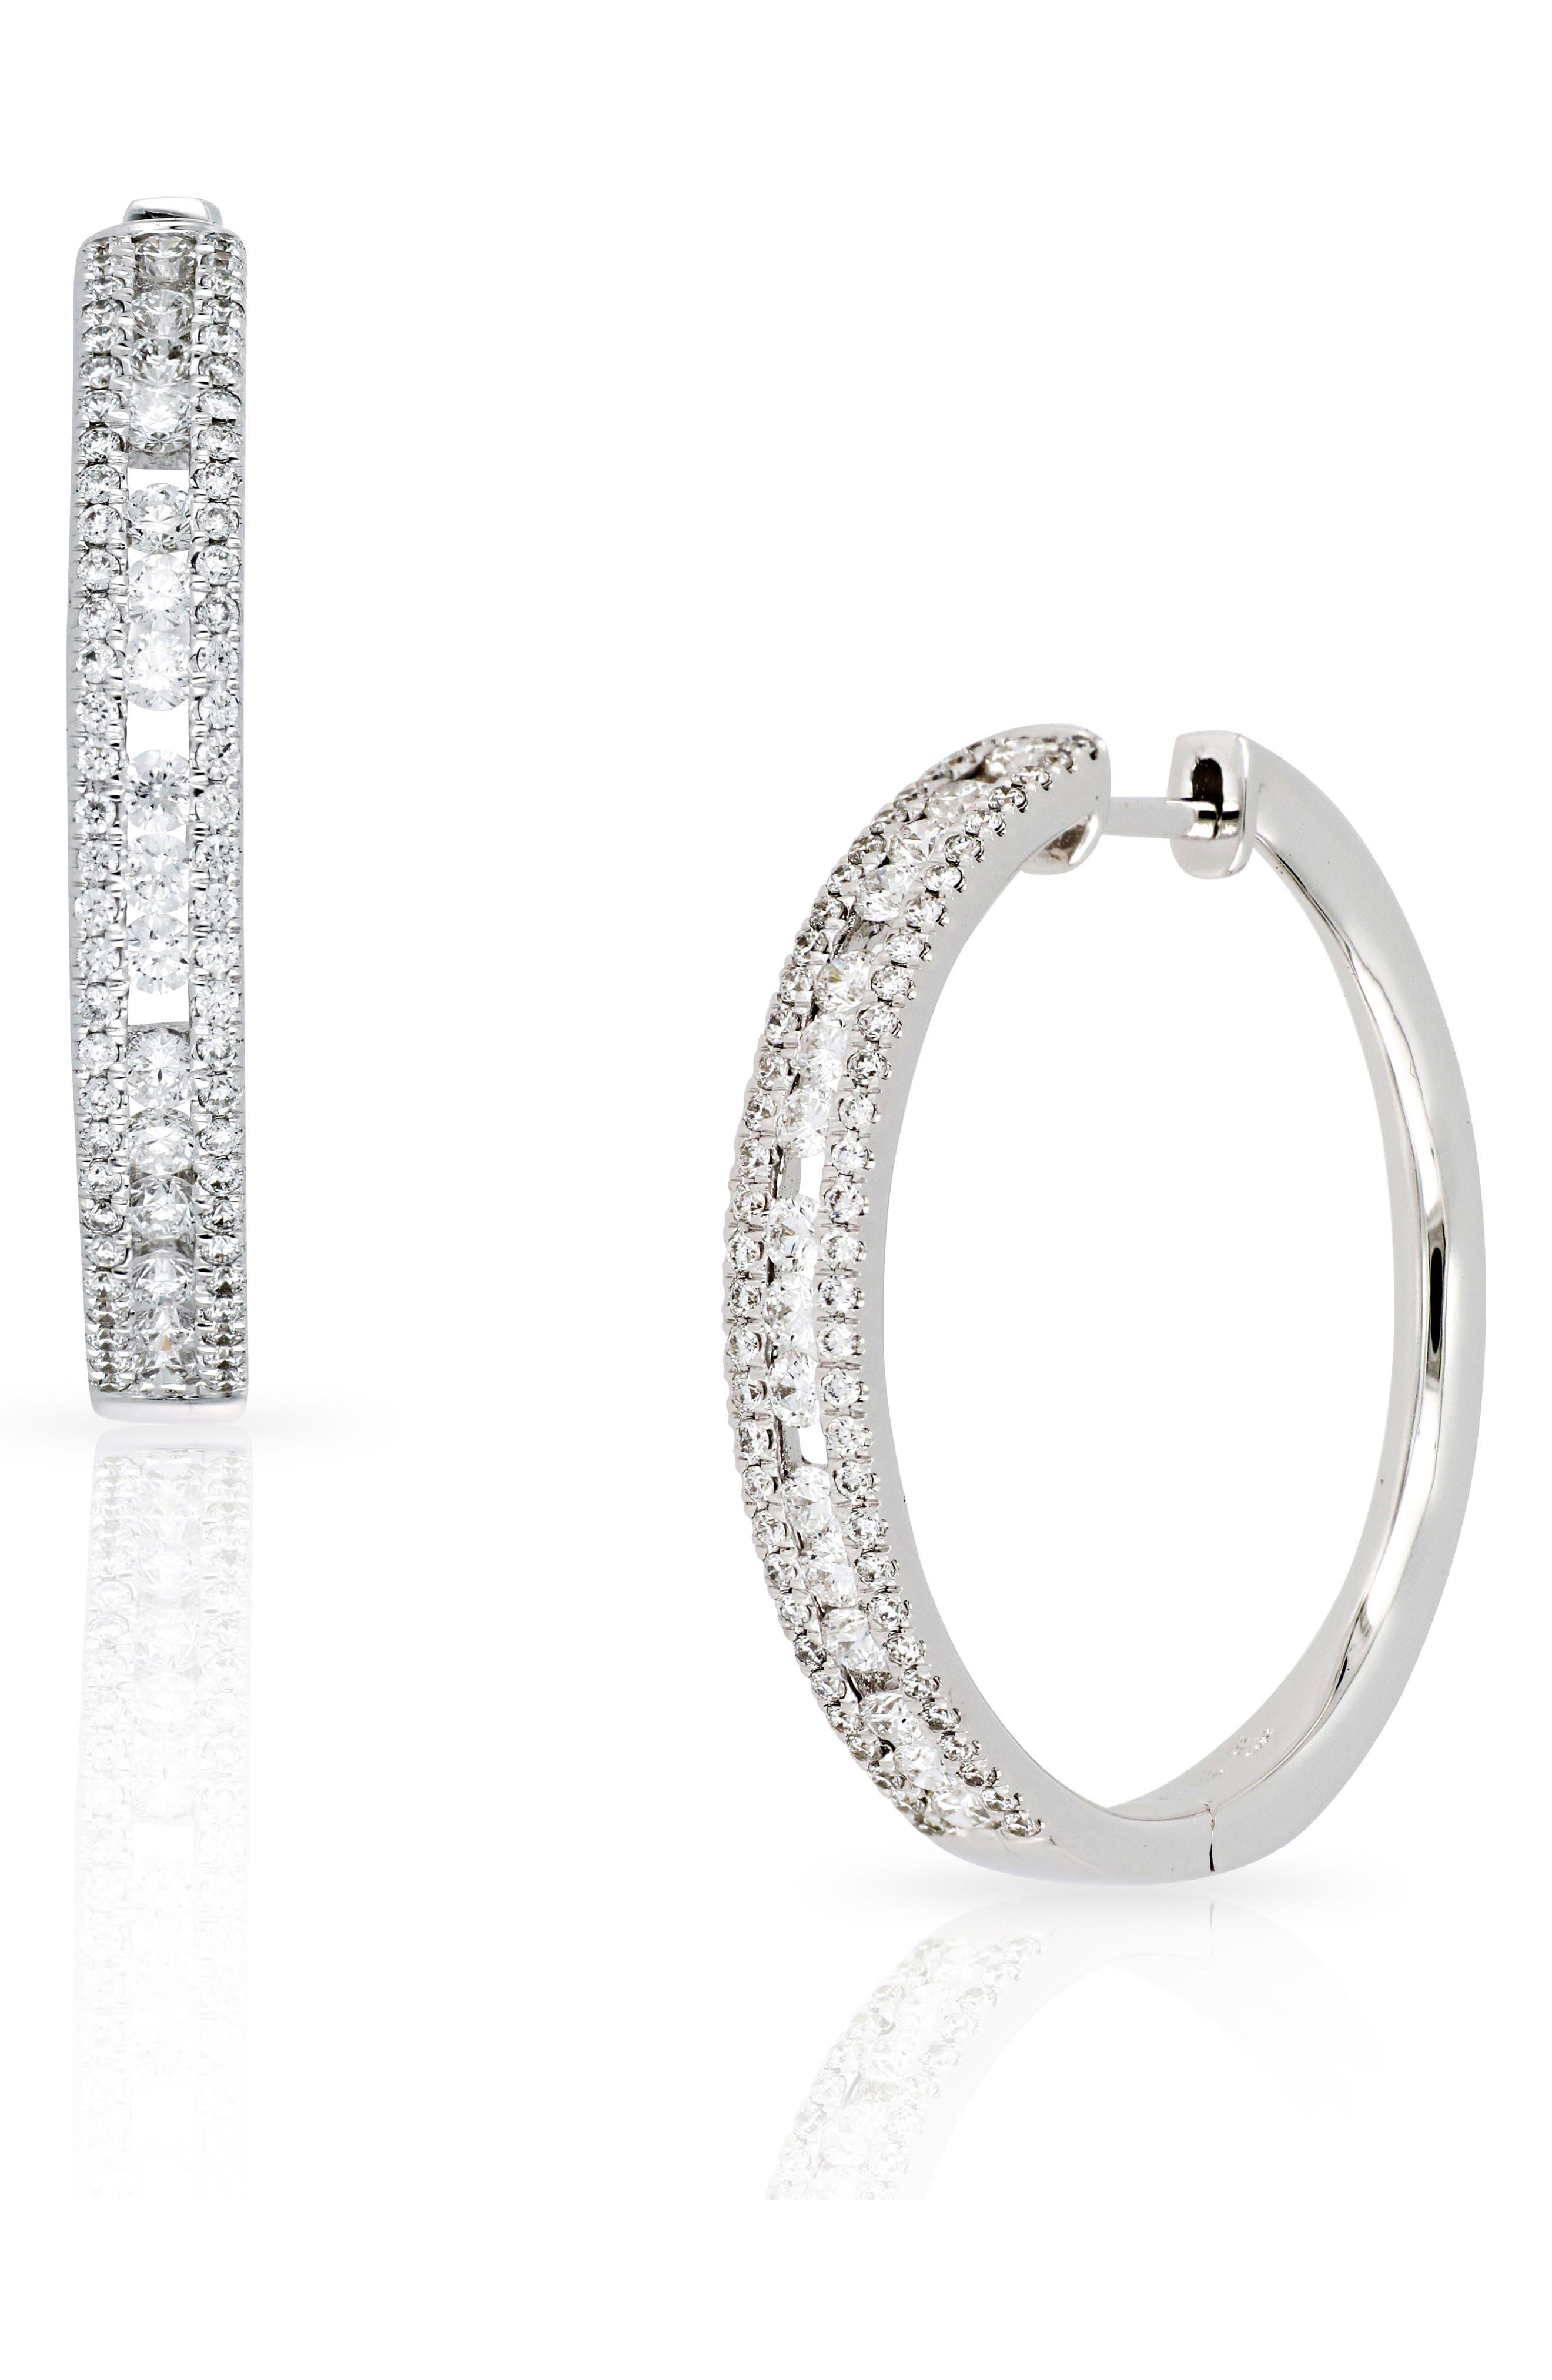 Amara Large Hoop Diamond Earrings,                         Main,                         color, White Gold